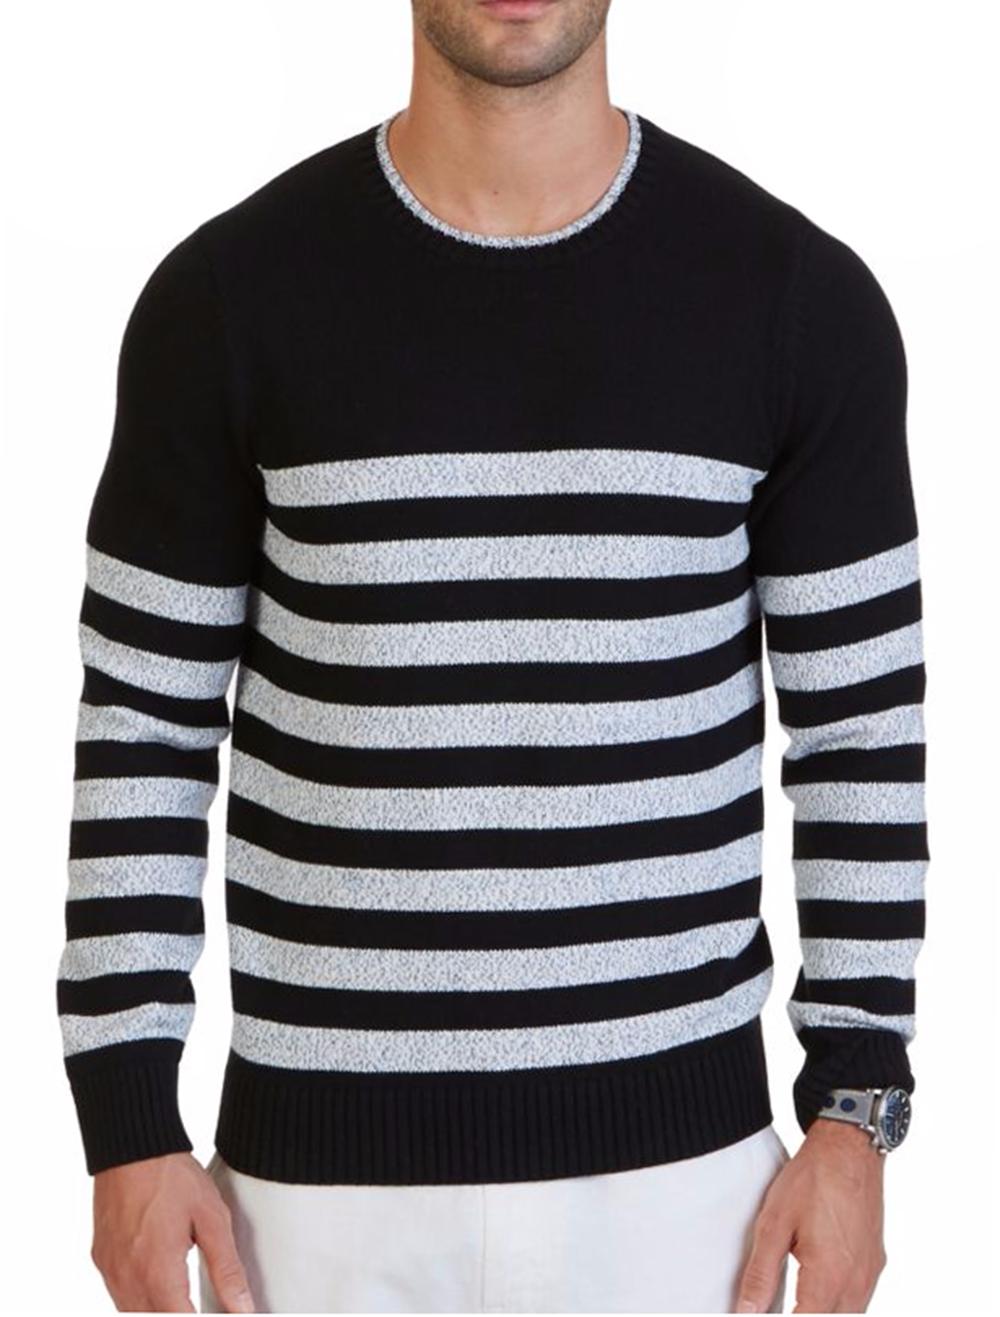 Nautica Men's Breton Striped Sweater, True Black, Size XXL, MSRP $148